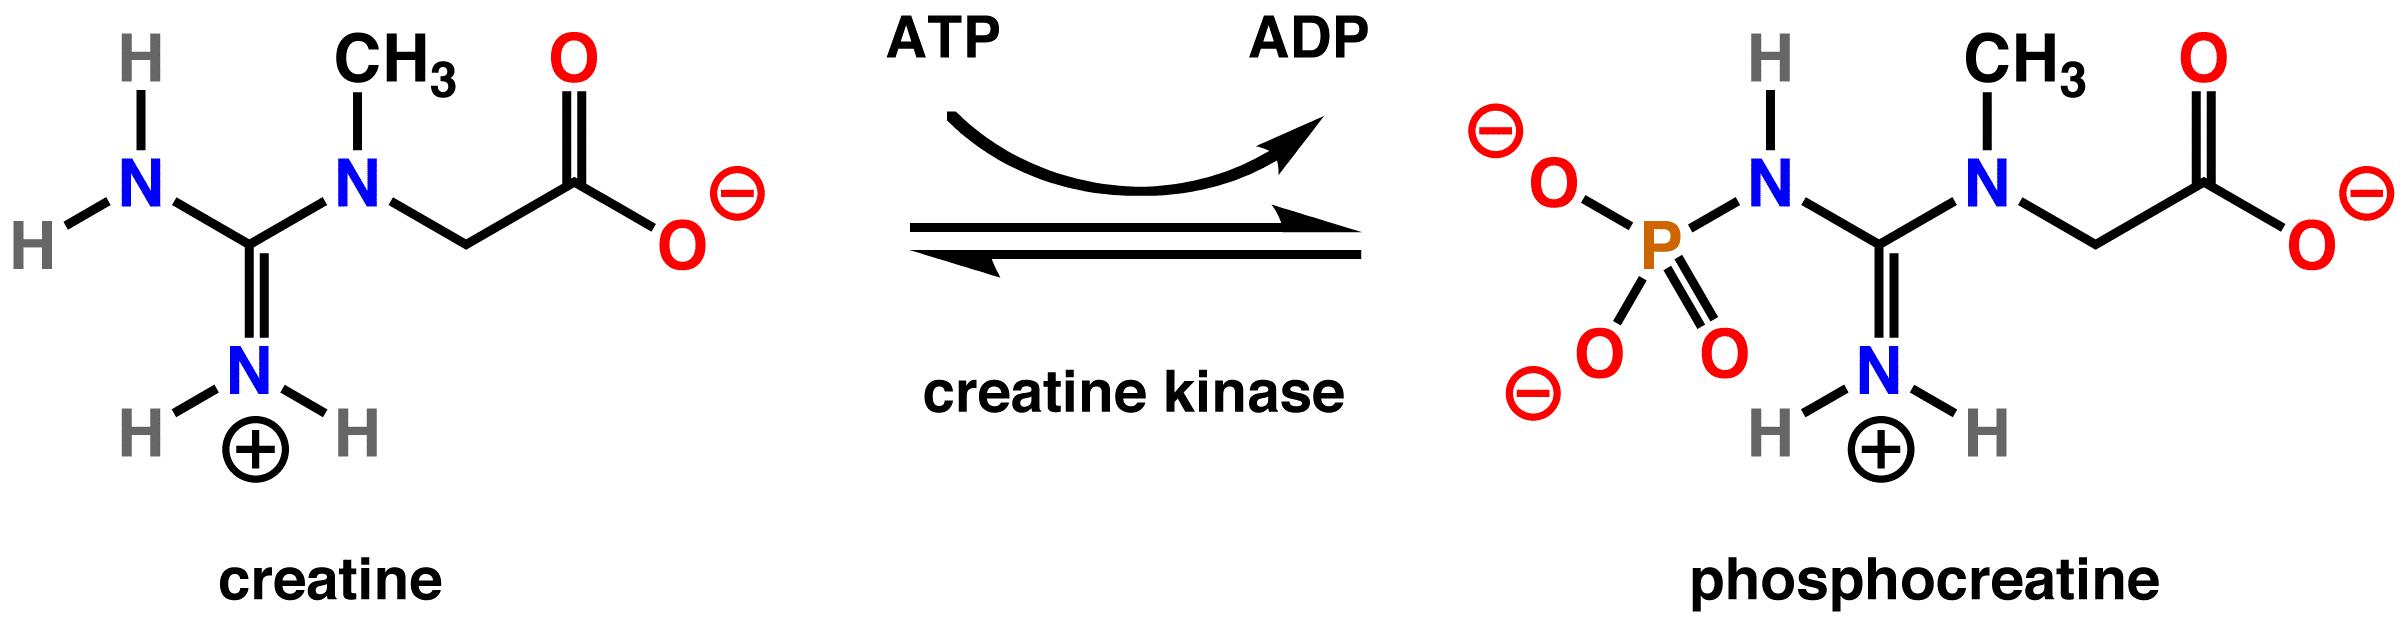 Creatine kinase 1100